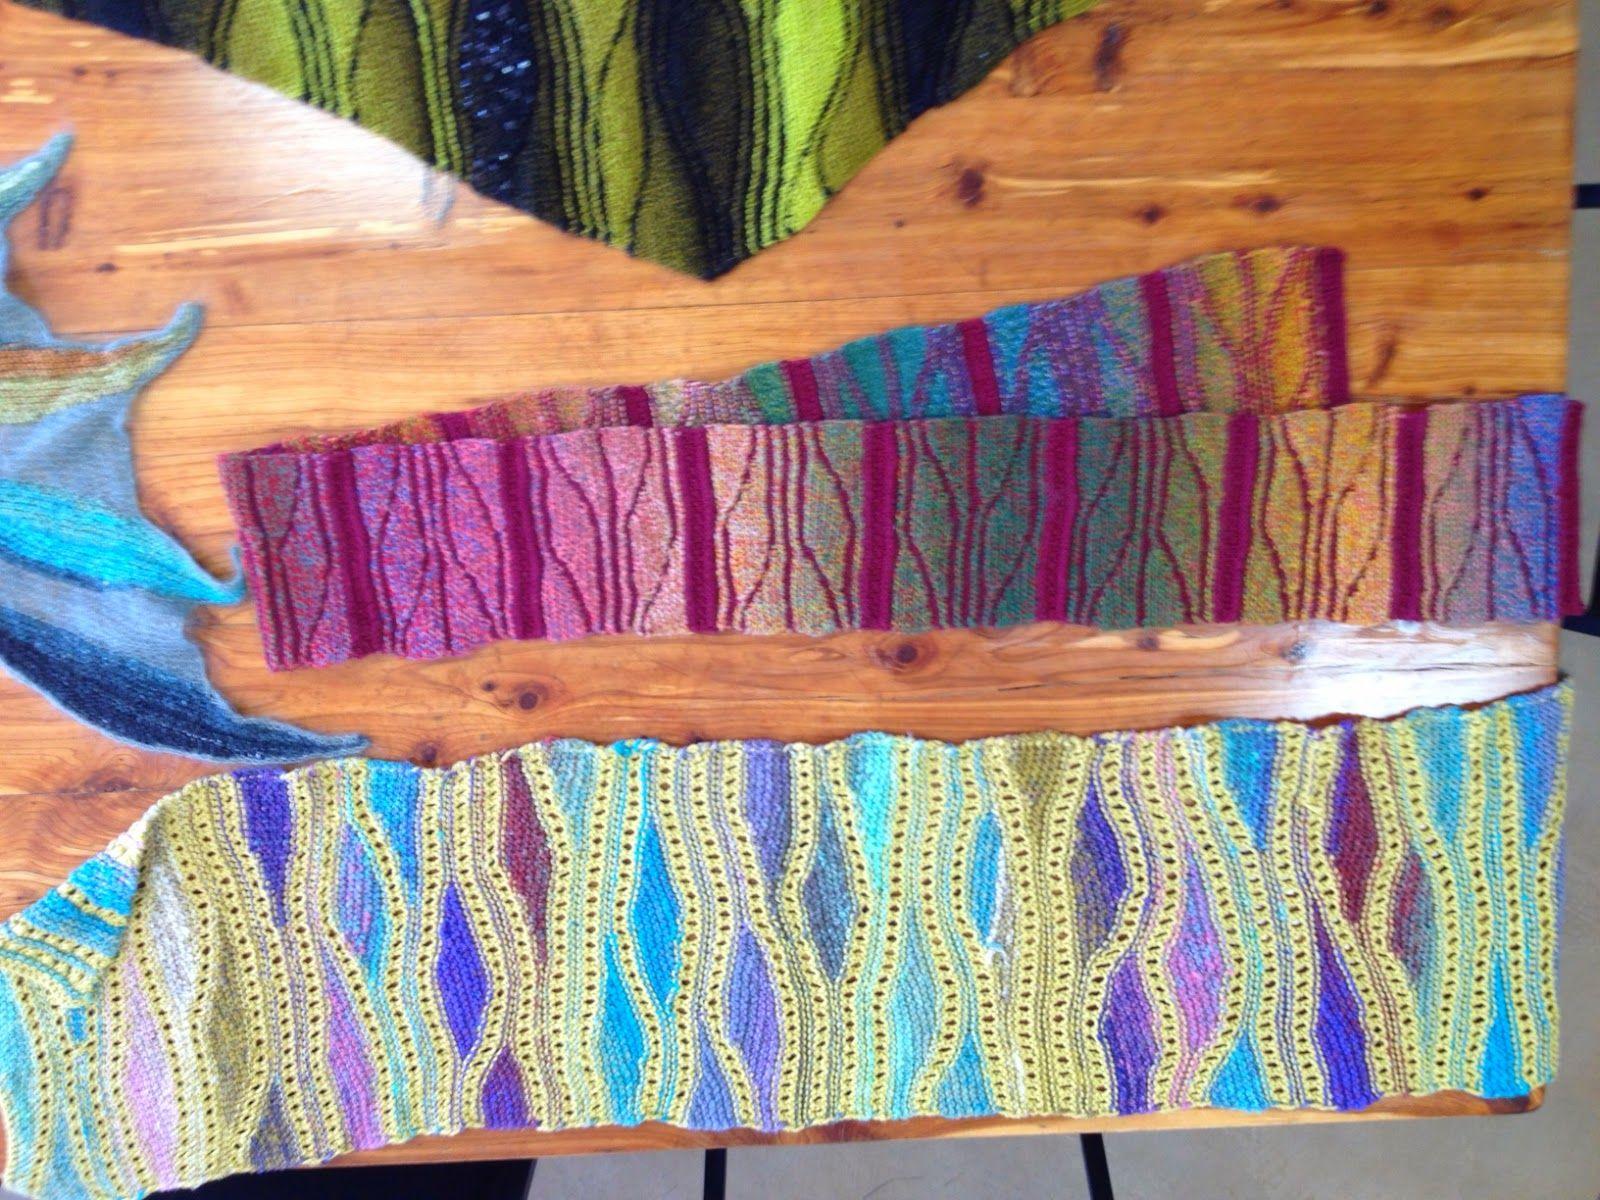 Swing knitting pattern google short row knitting etc swing knitting pattern google bankloansurffo Images